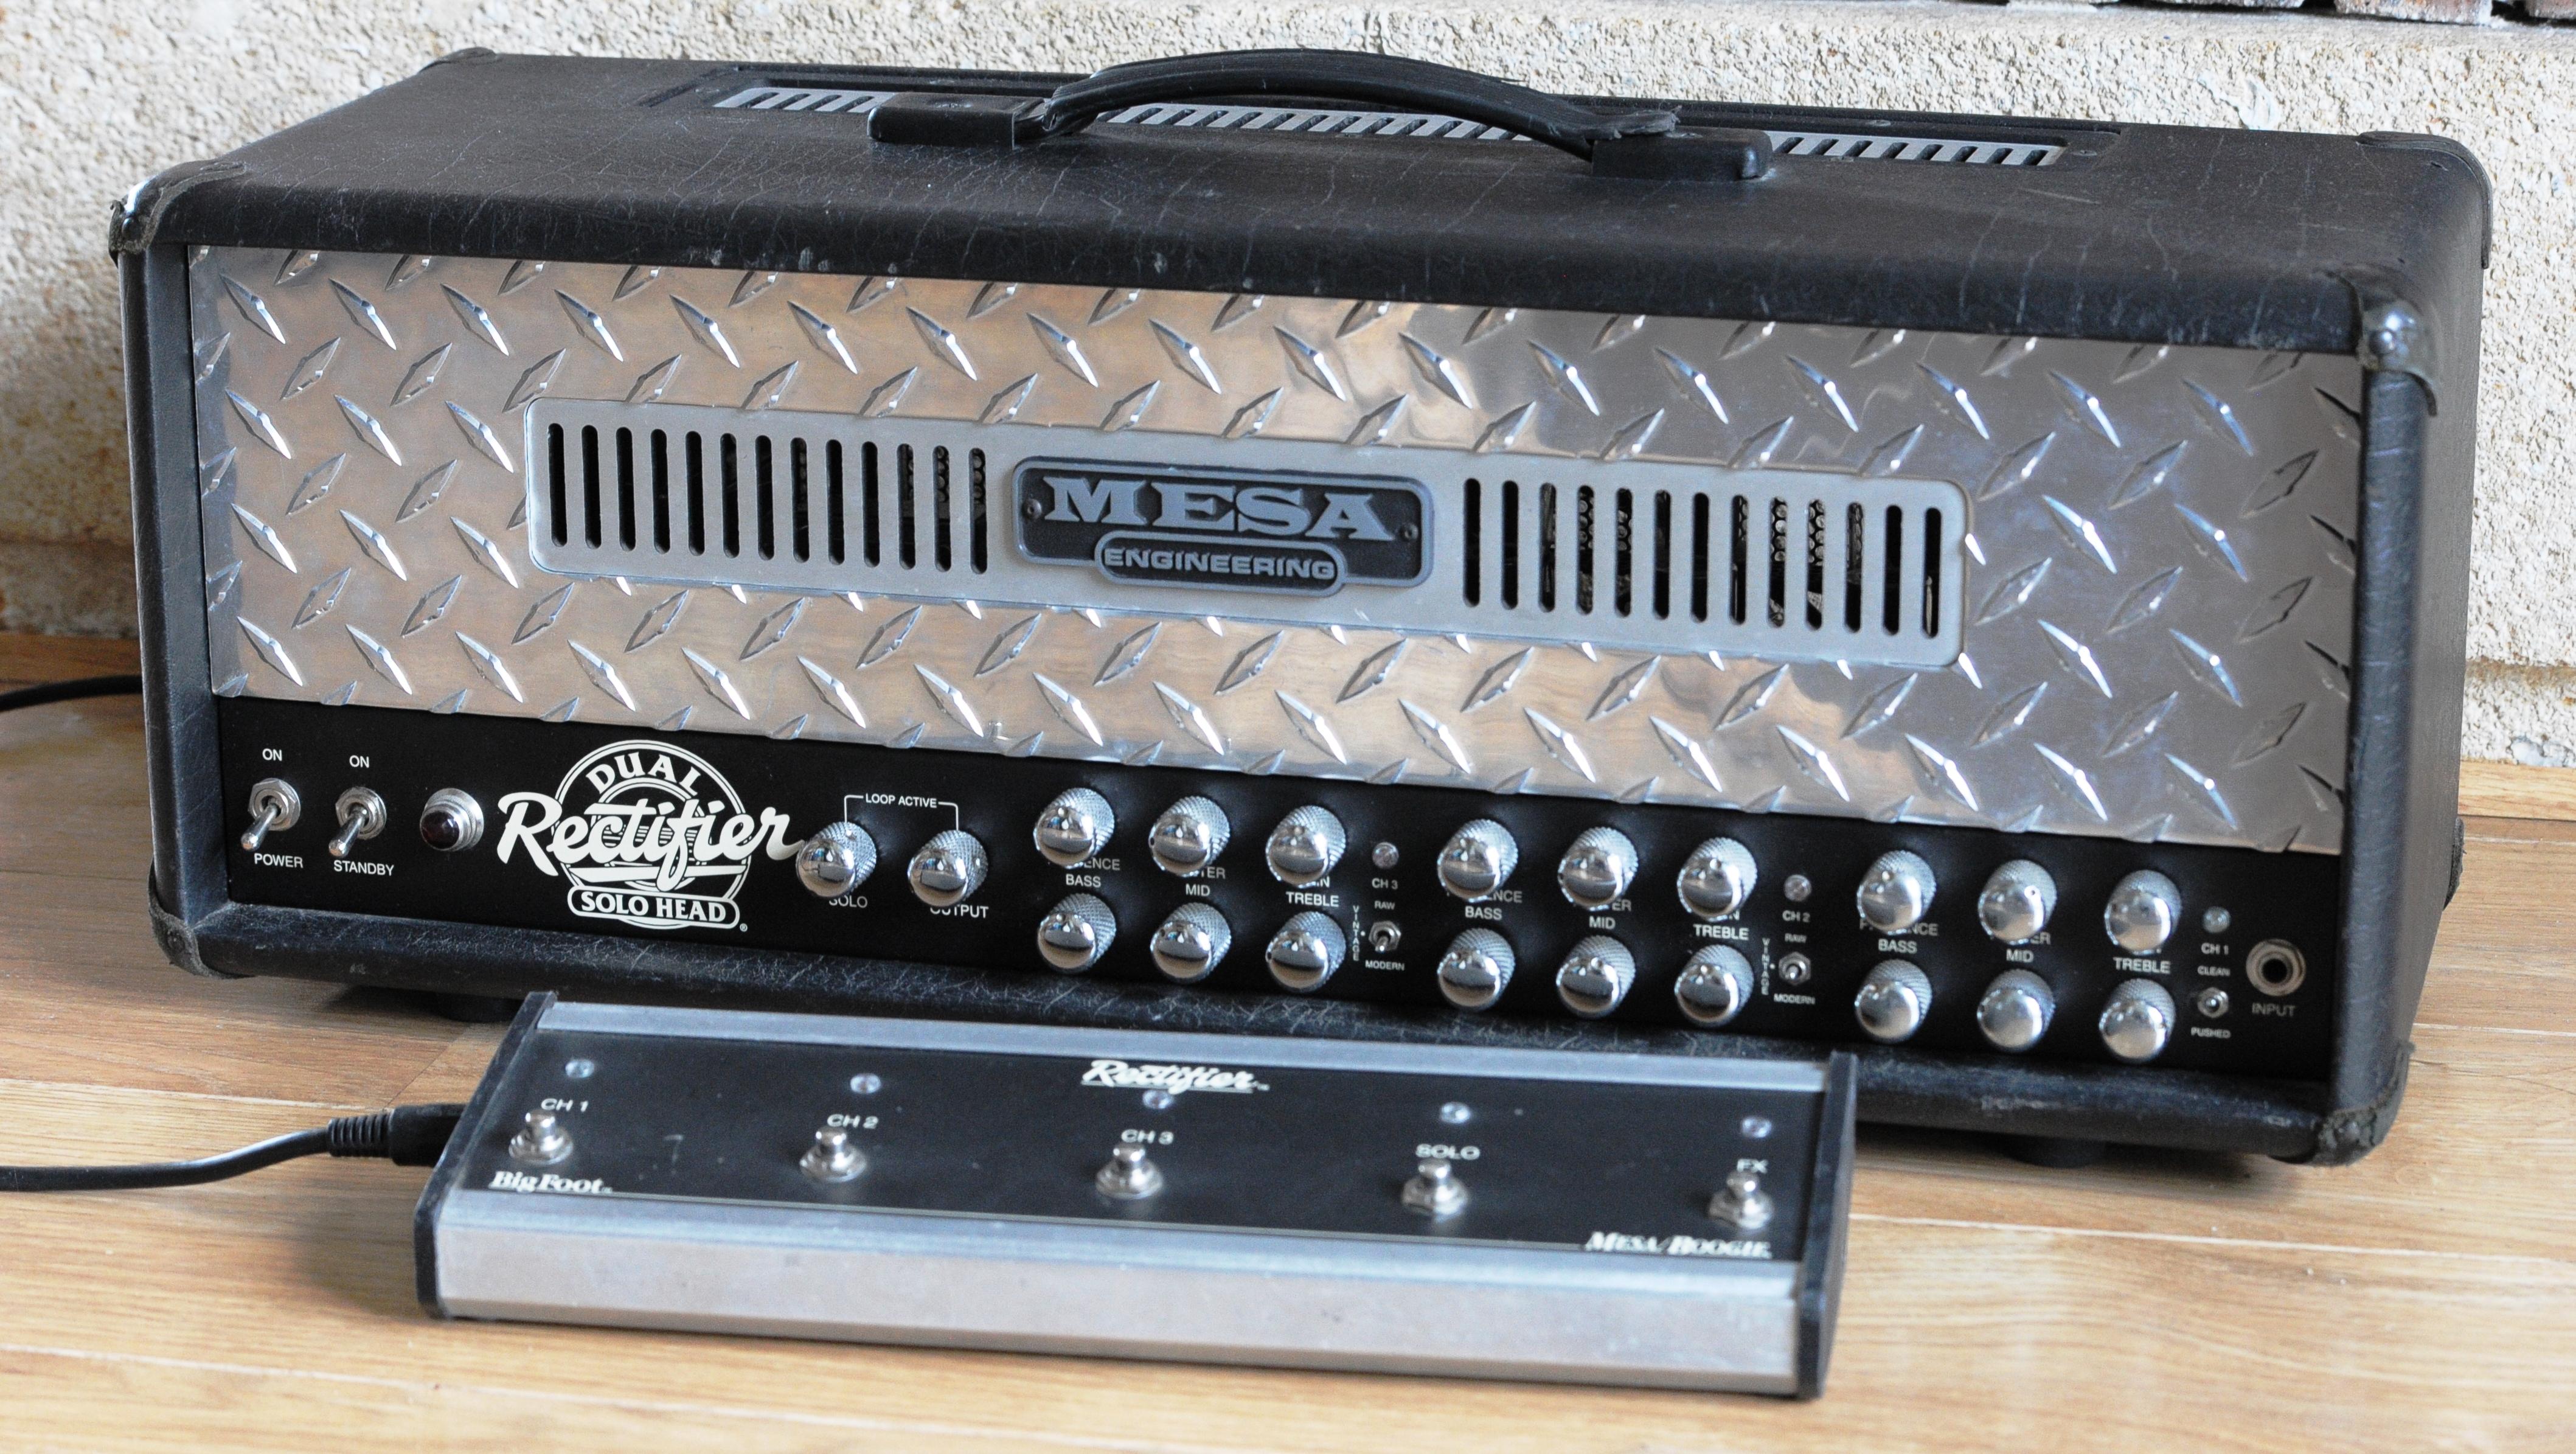 Mesa Boogie Dual rectifier solo head 100w image 1219012